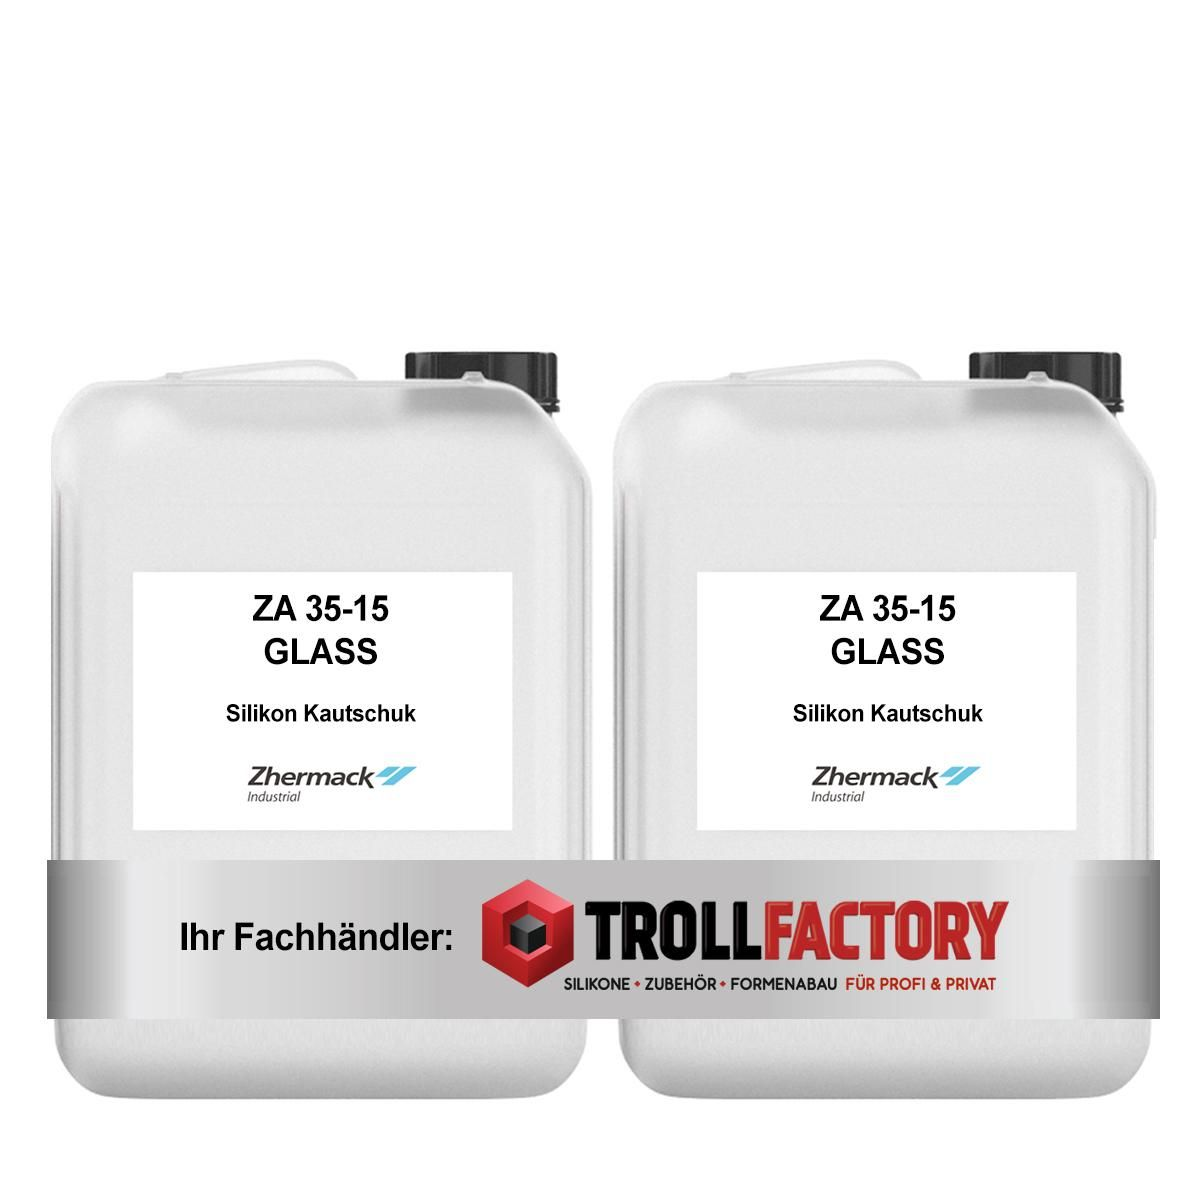 Zhermack Silikon Kautschuk ZA 35-15 GLASSKLAR Glas Special Effect 10kg